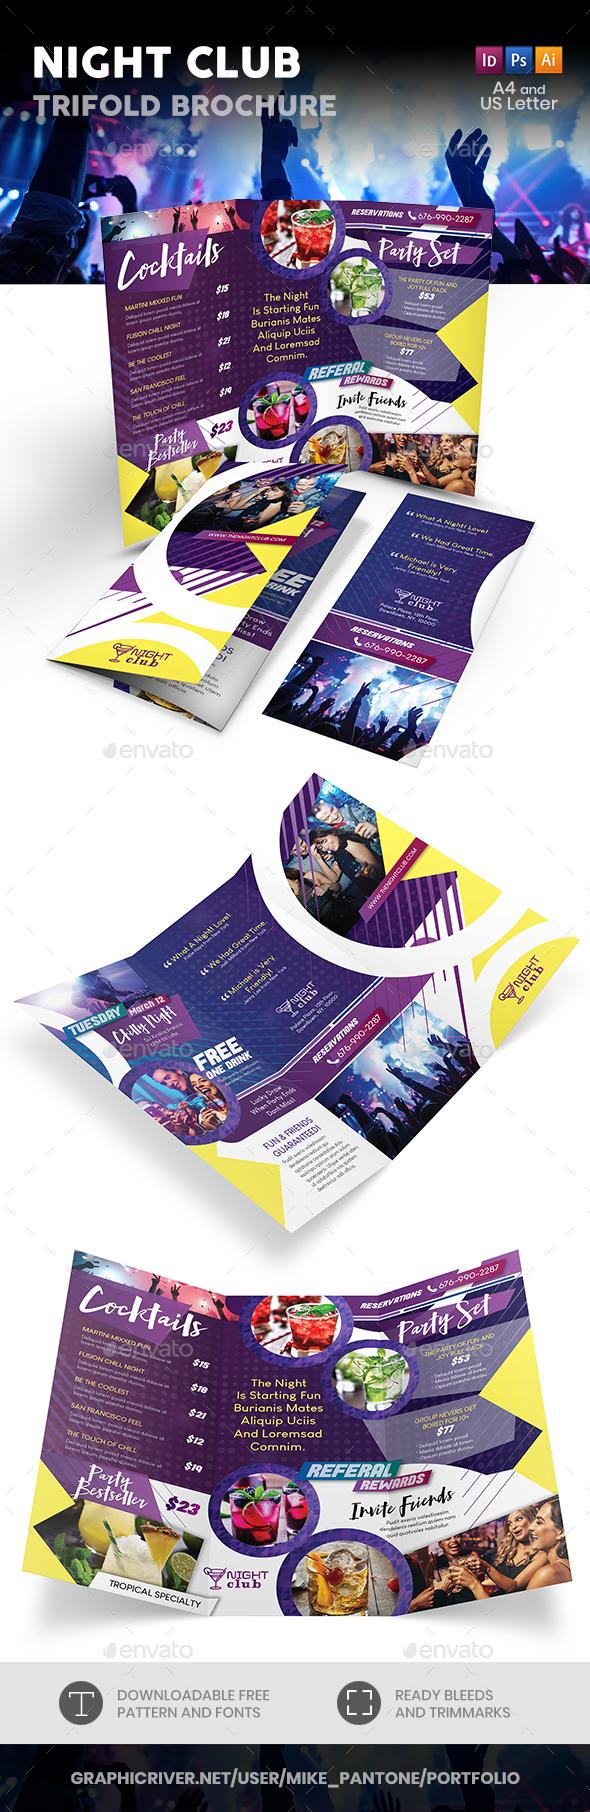 Night Club Trifold Brochure - Informational Brochures